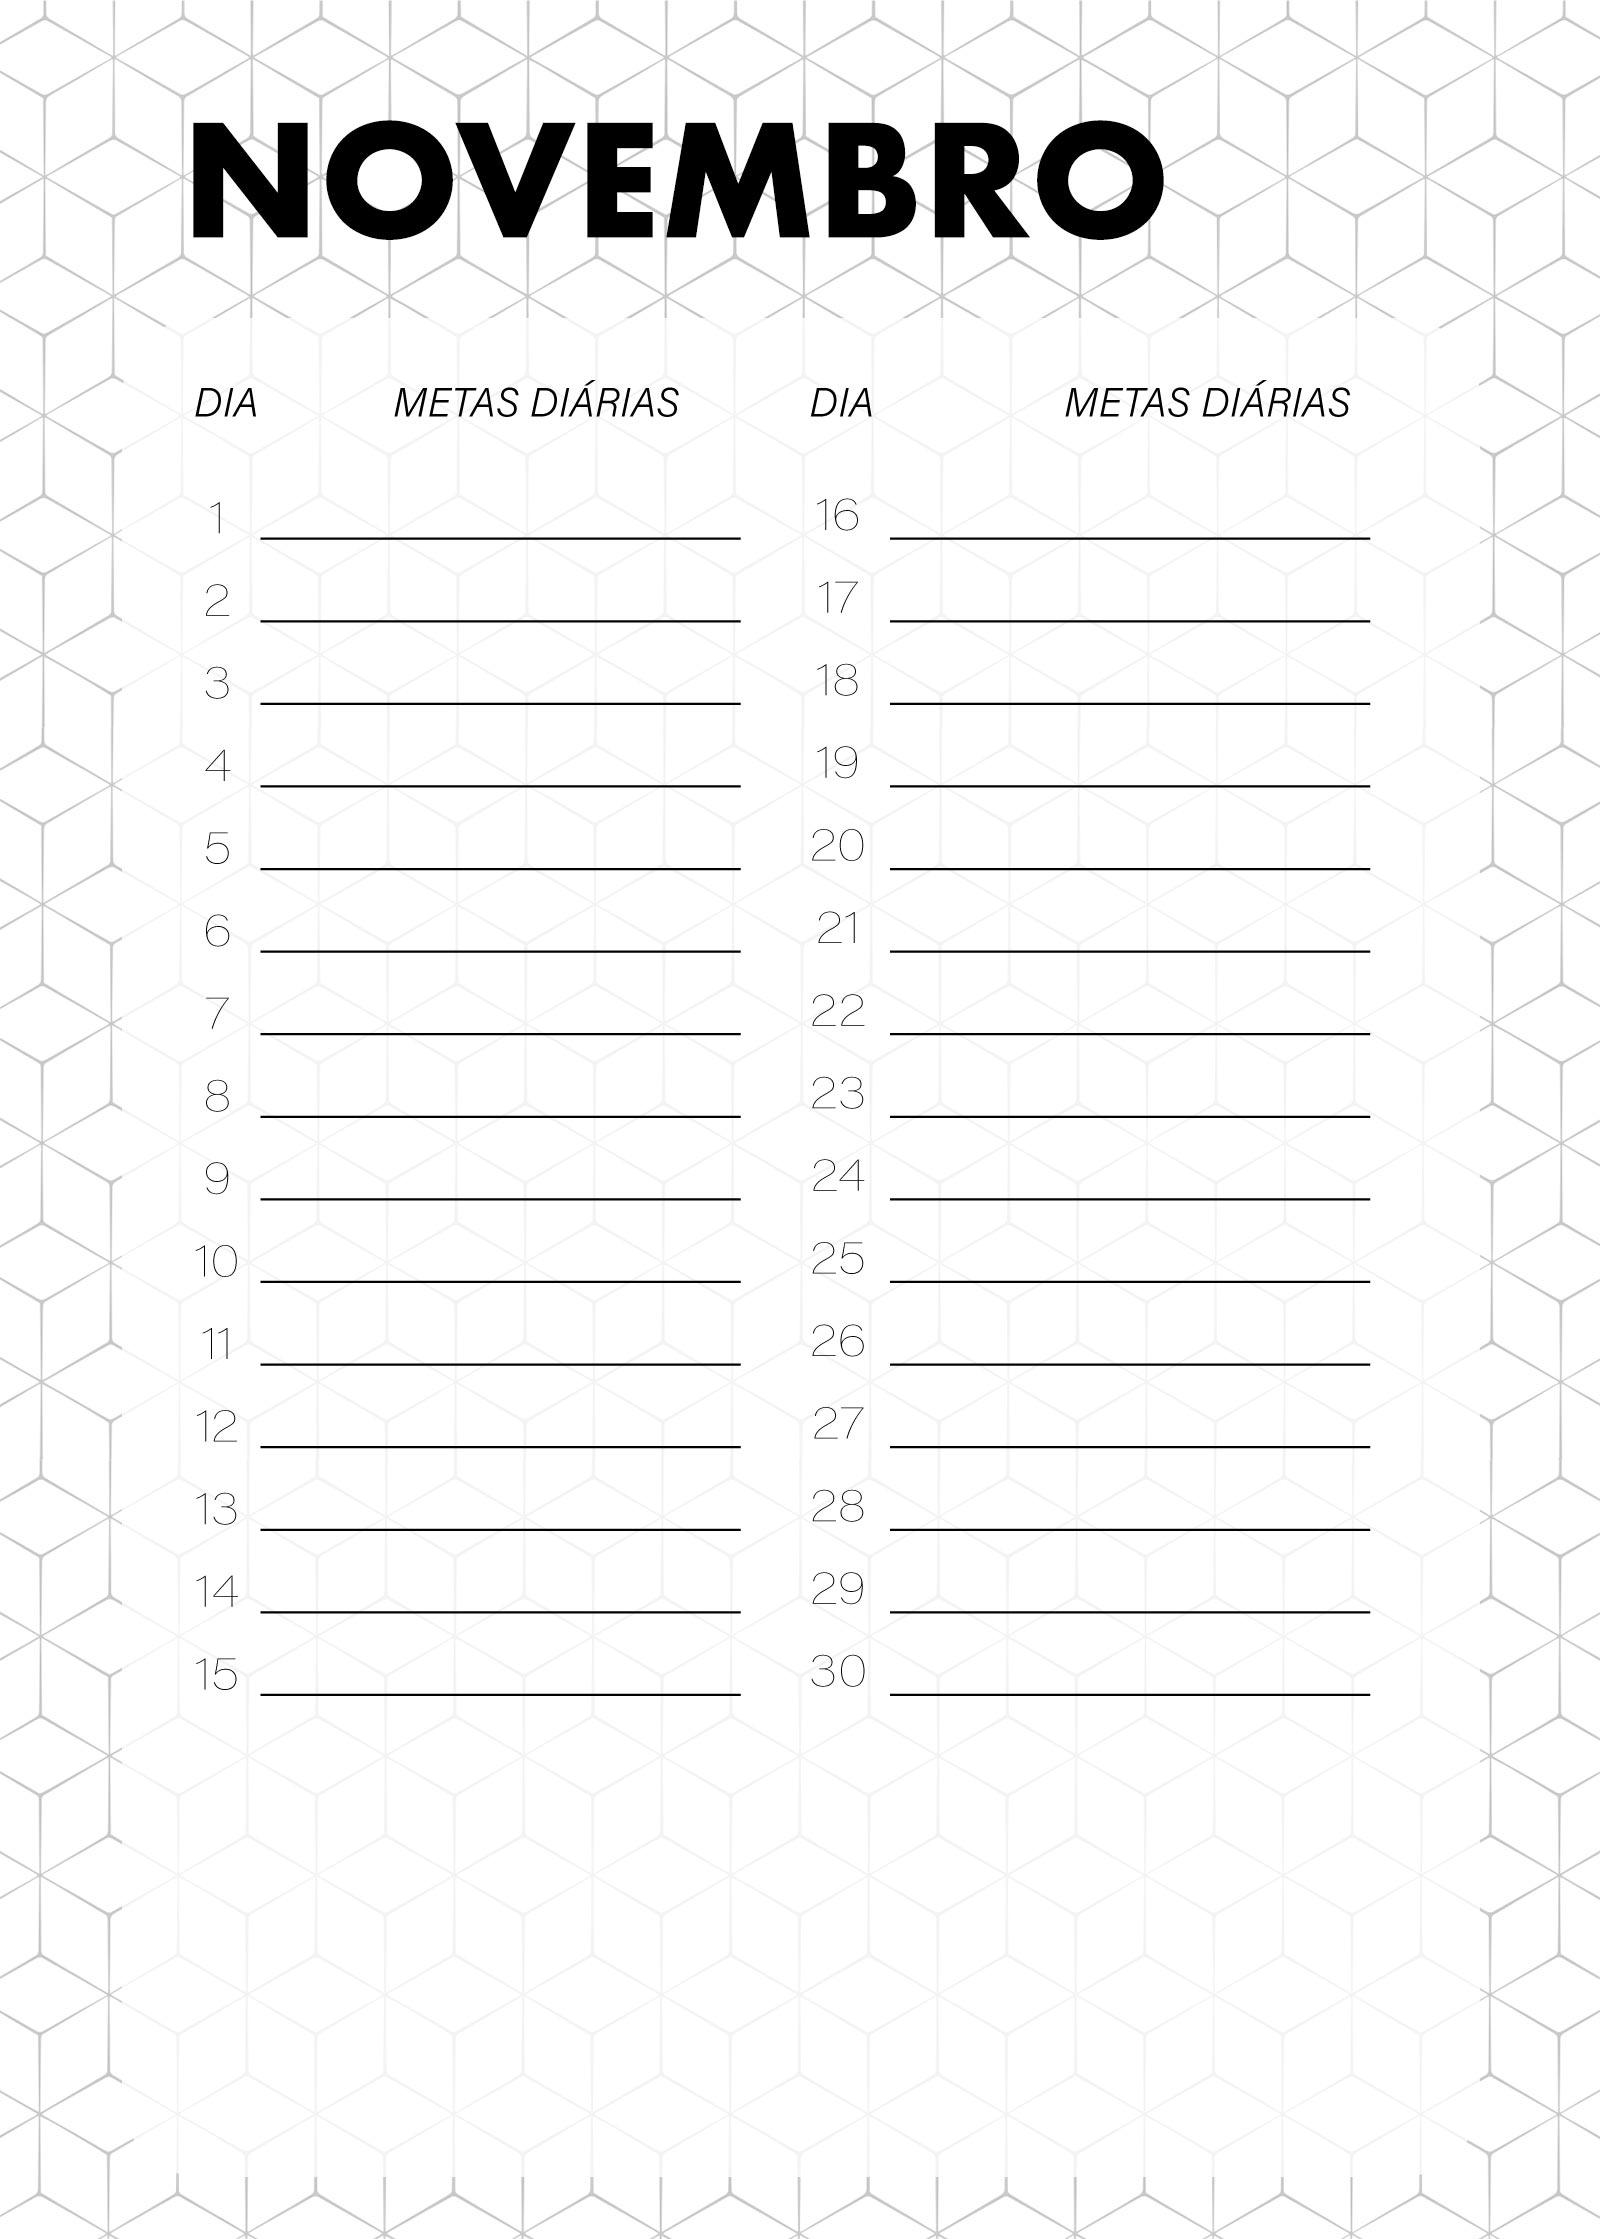 Planner Preto e Branco Metas Diarias Novembro